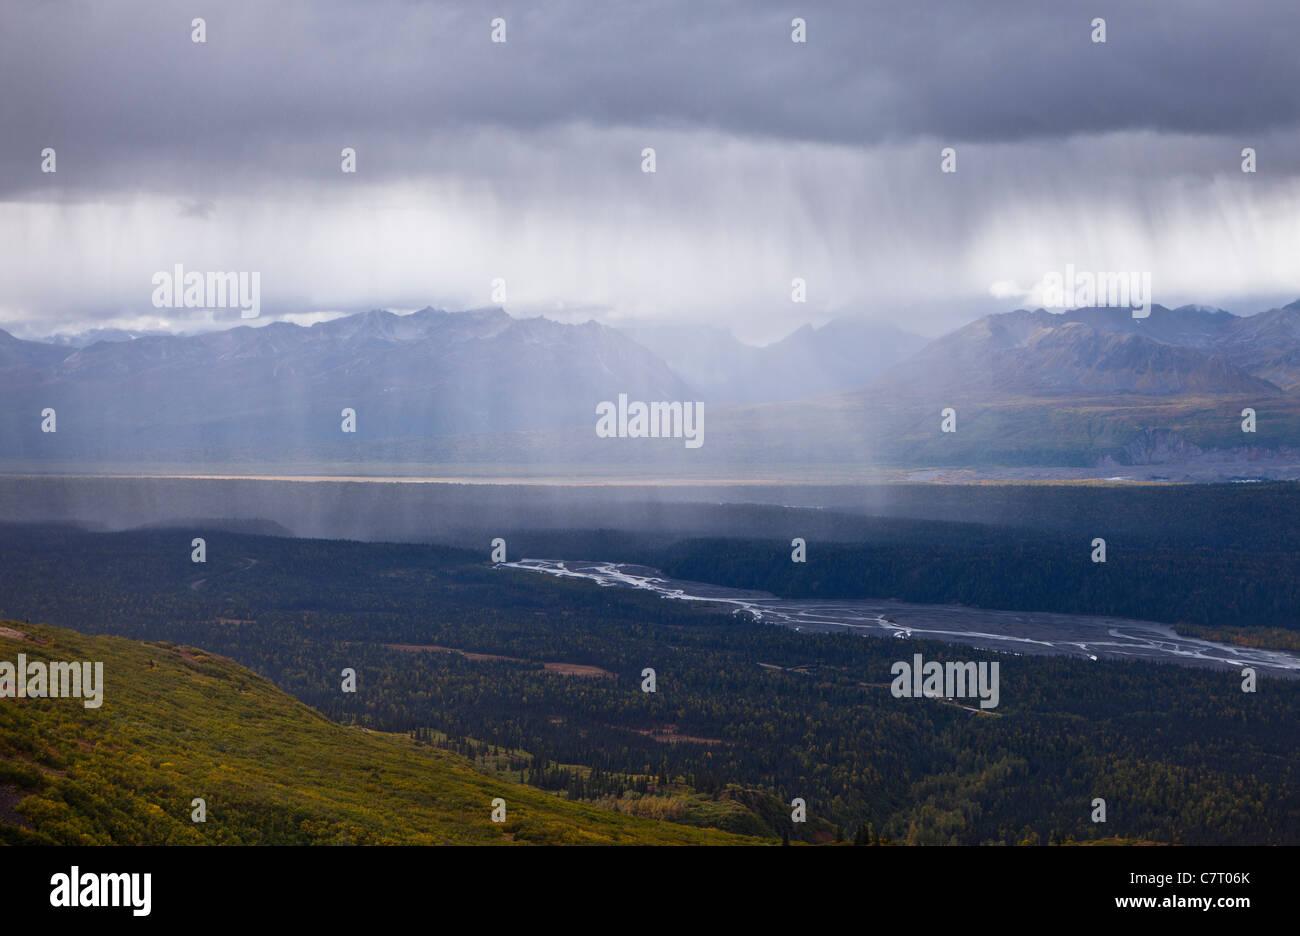 DENALI STATE PARK, ALASKA, USA - Rain storm in Chulitna River valley, seen from Kesugi Ridge. - Stock Image